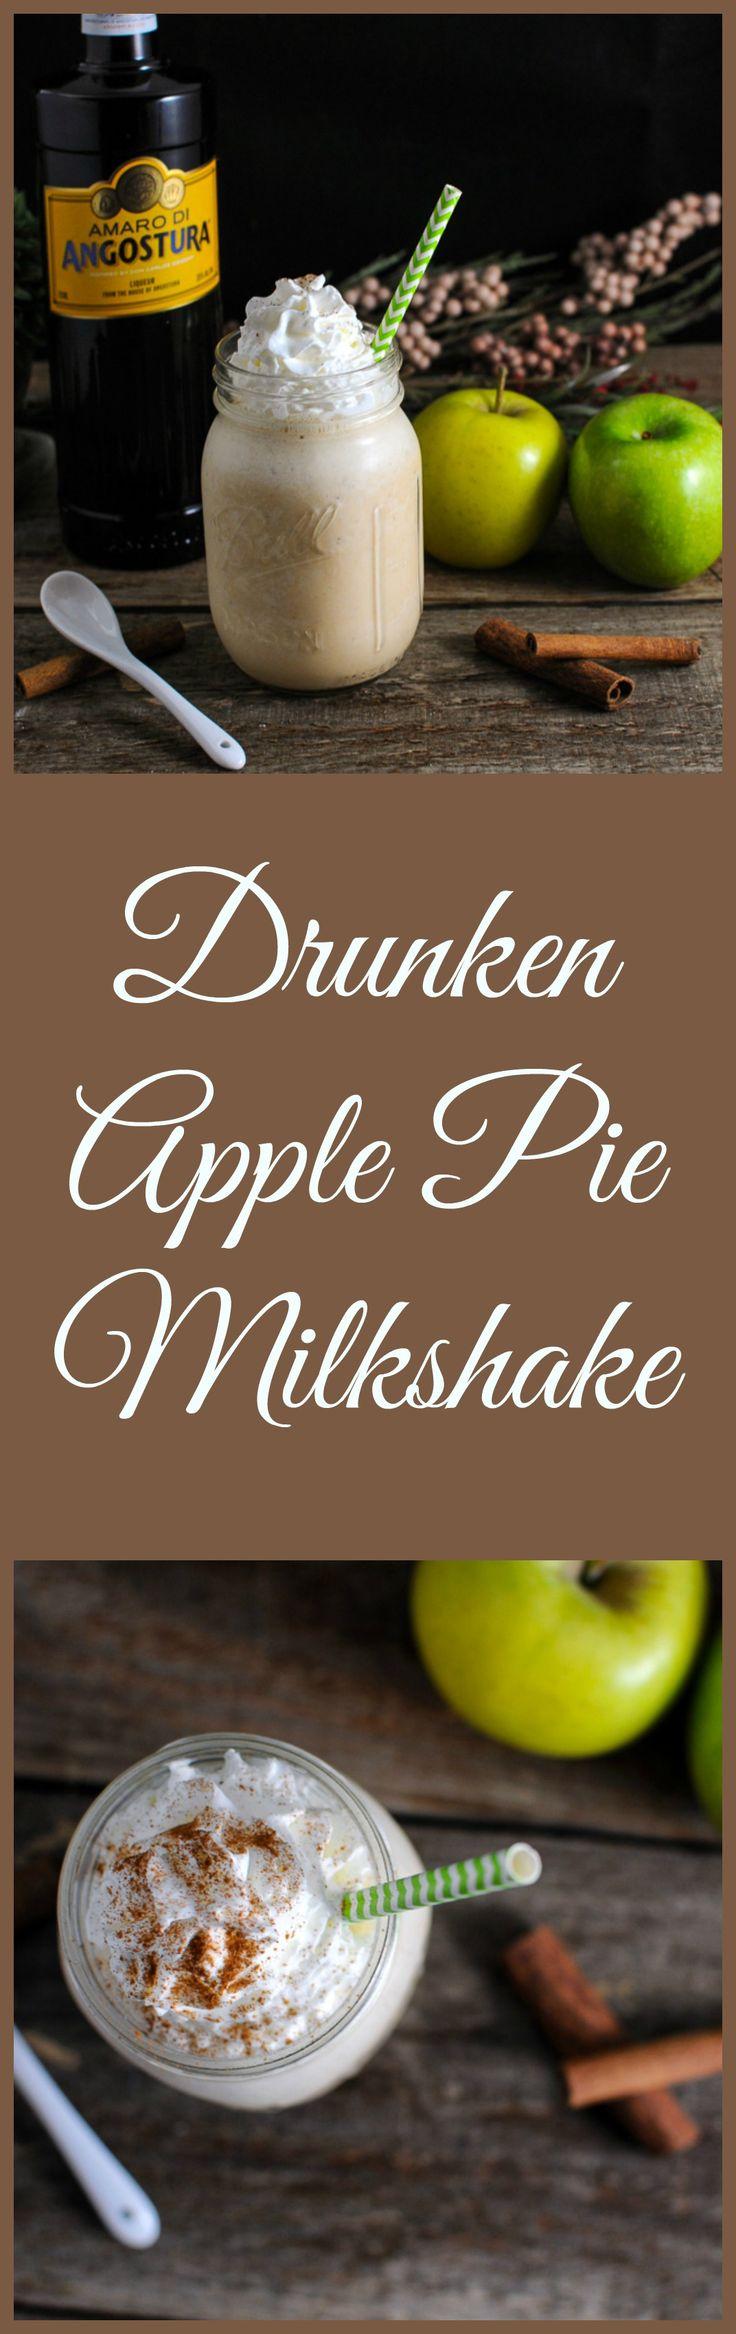 Vodka, Amaro, apples, ice cream, graham crackers, and milk in this Drunken Apple Pie Milkshake! #apple #liquor #icecream #desserts